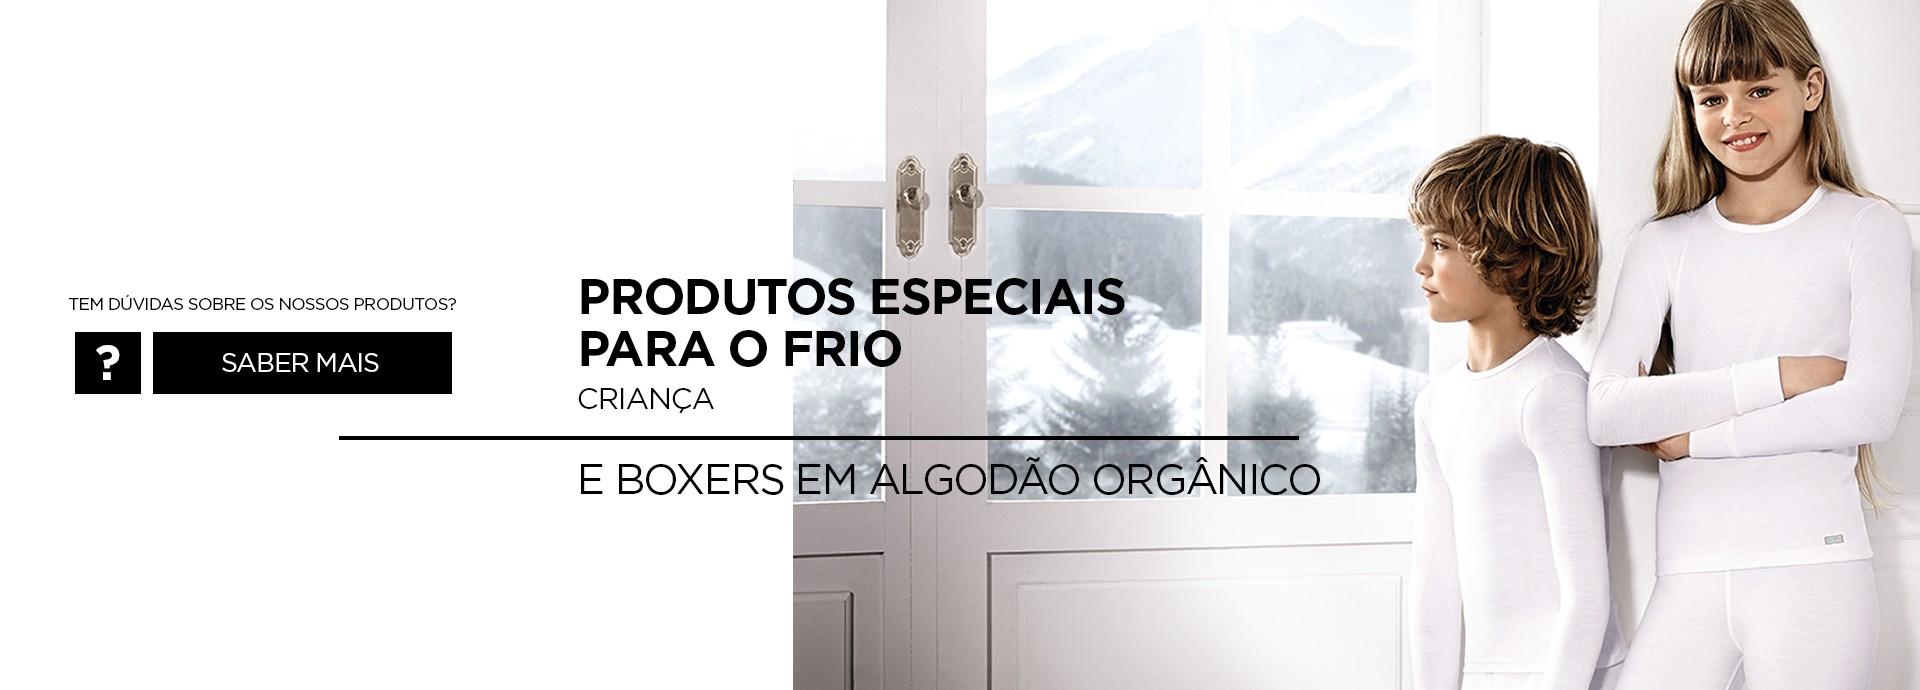 ROUPA DE INVERNO termicos e boxer organico